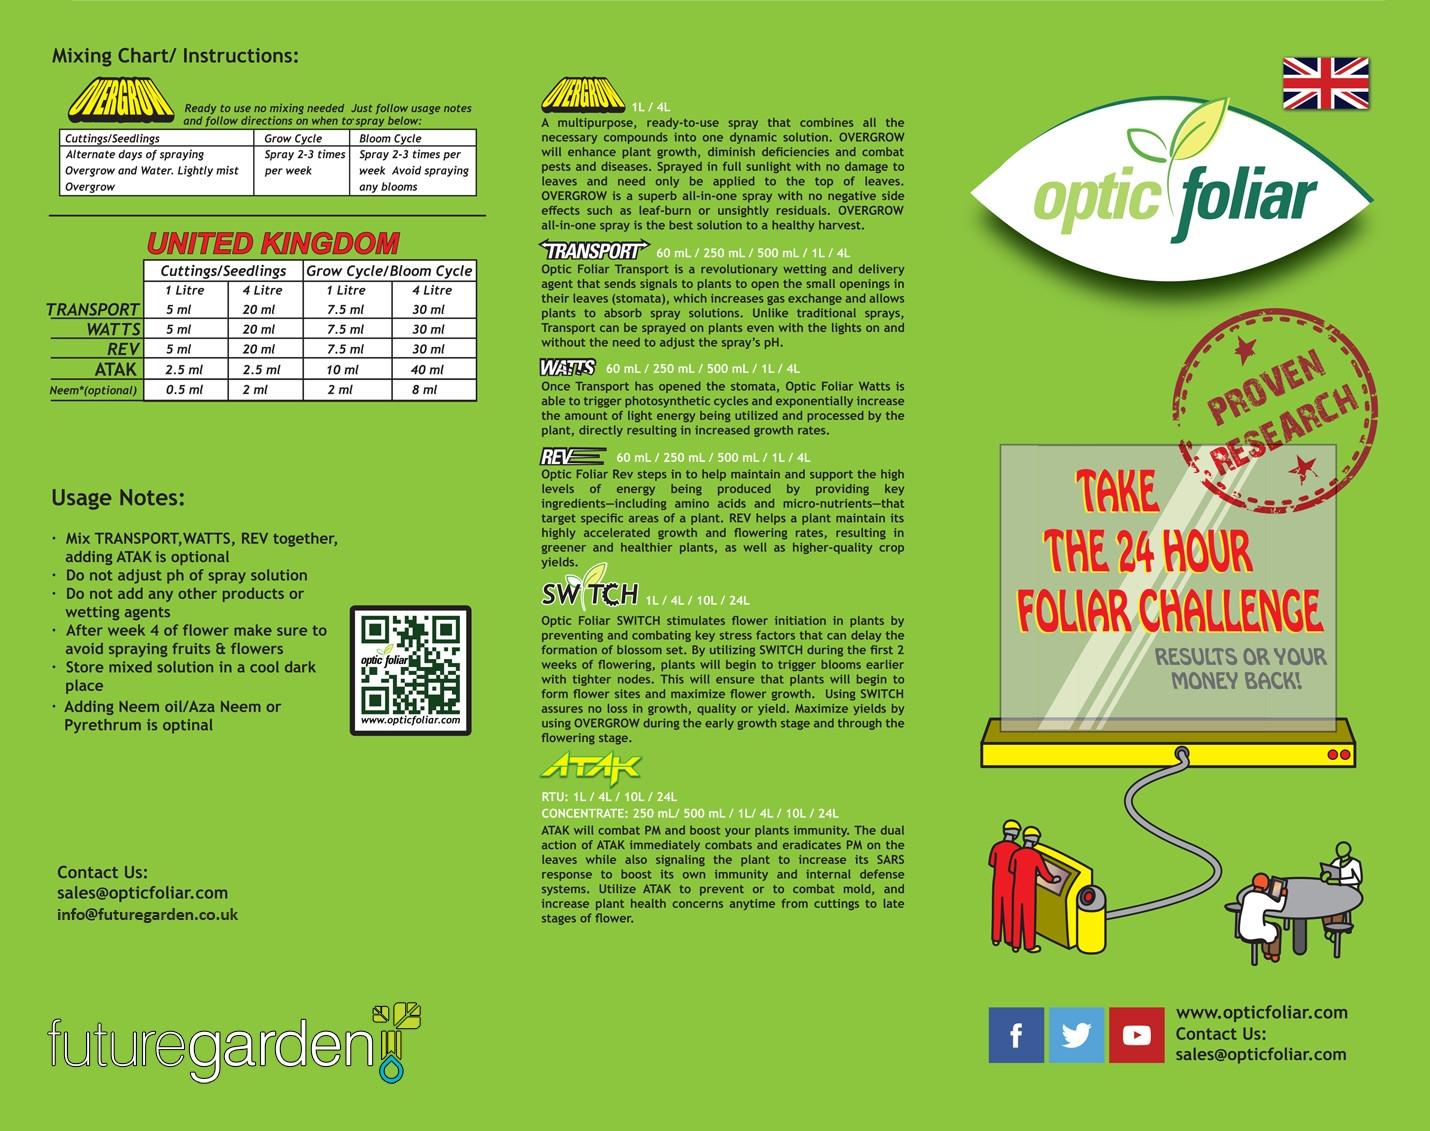 Optic foliar application rates